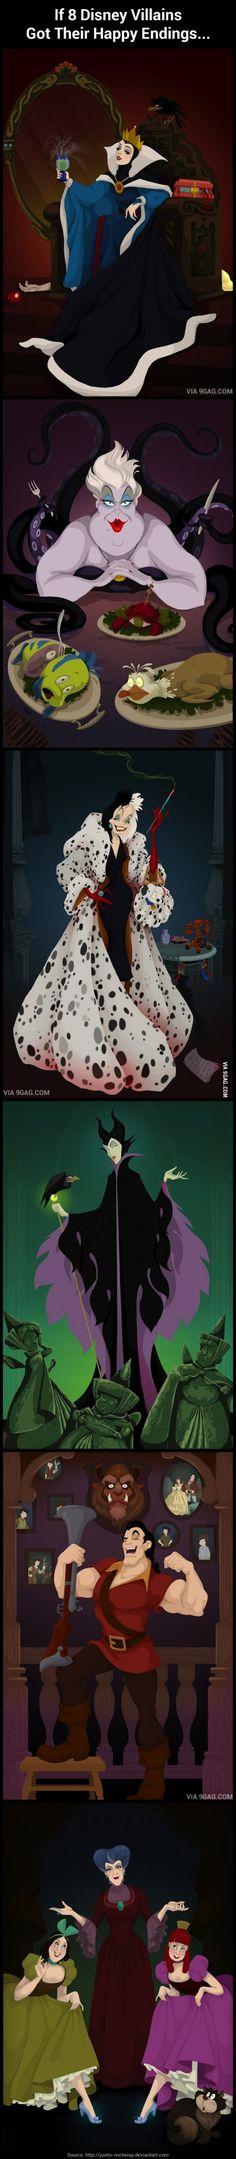 If 8 Disney Villains Got Their Happy Endings-Yay, Maleficent!